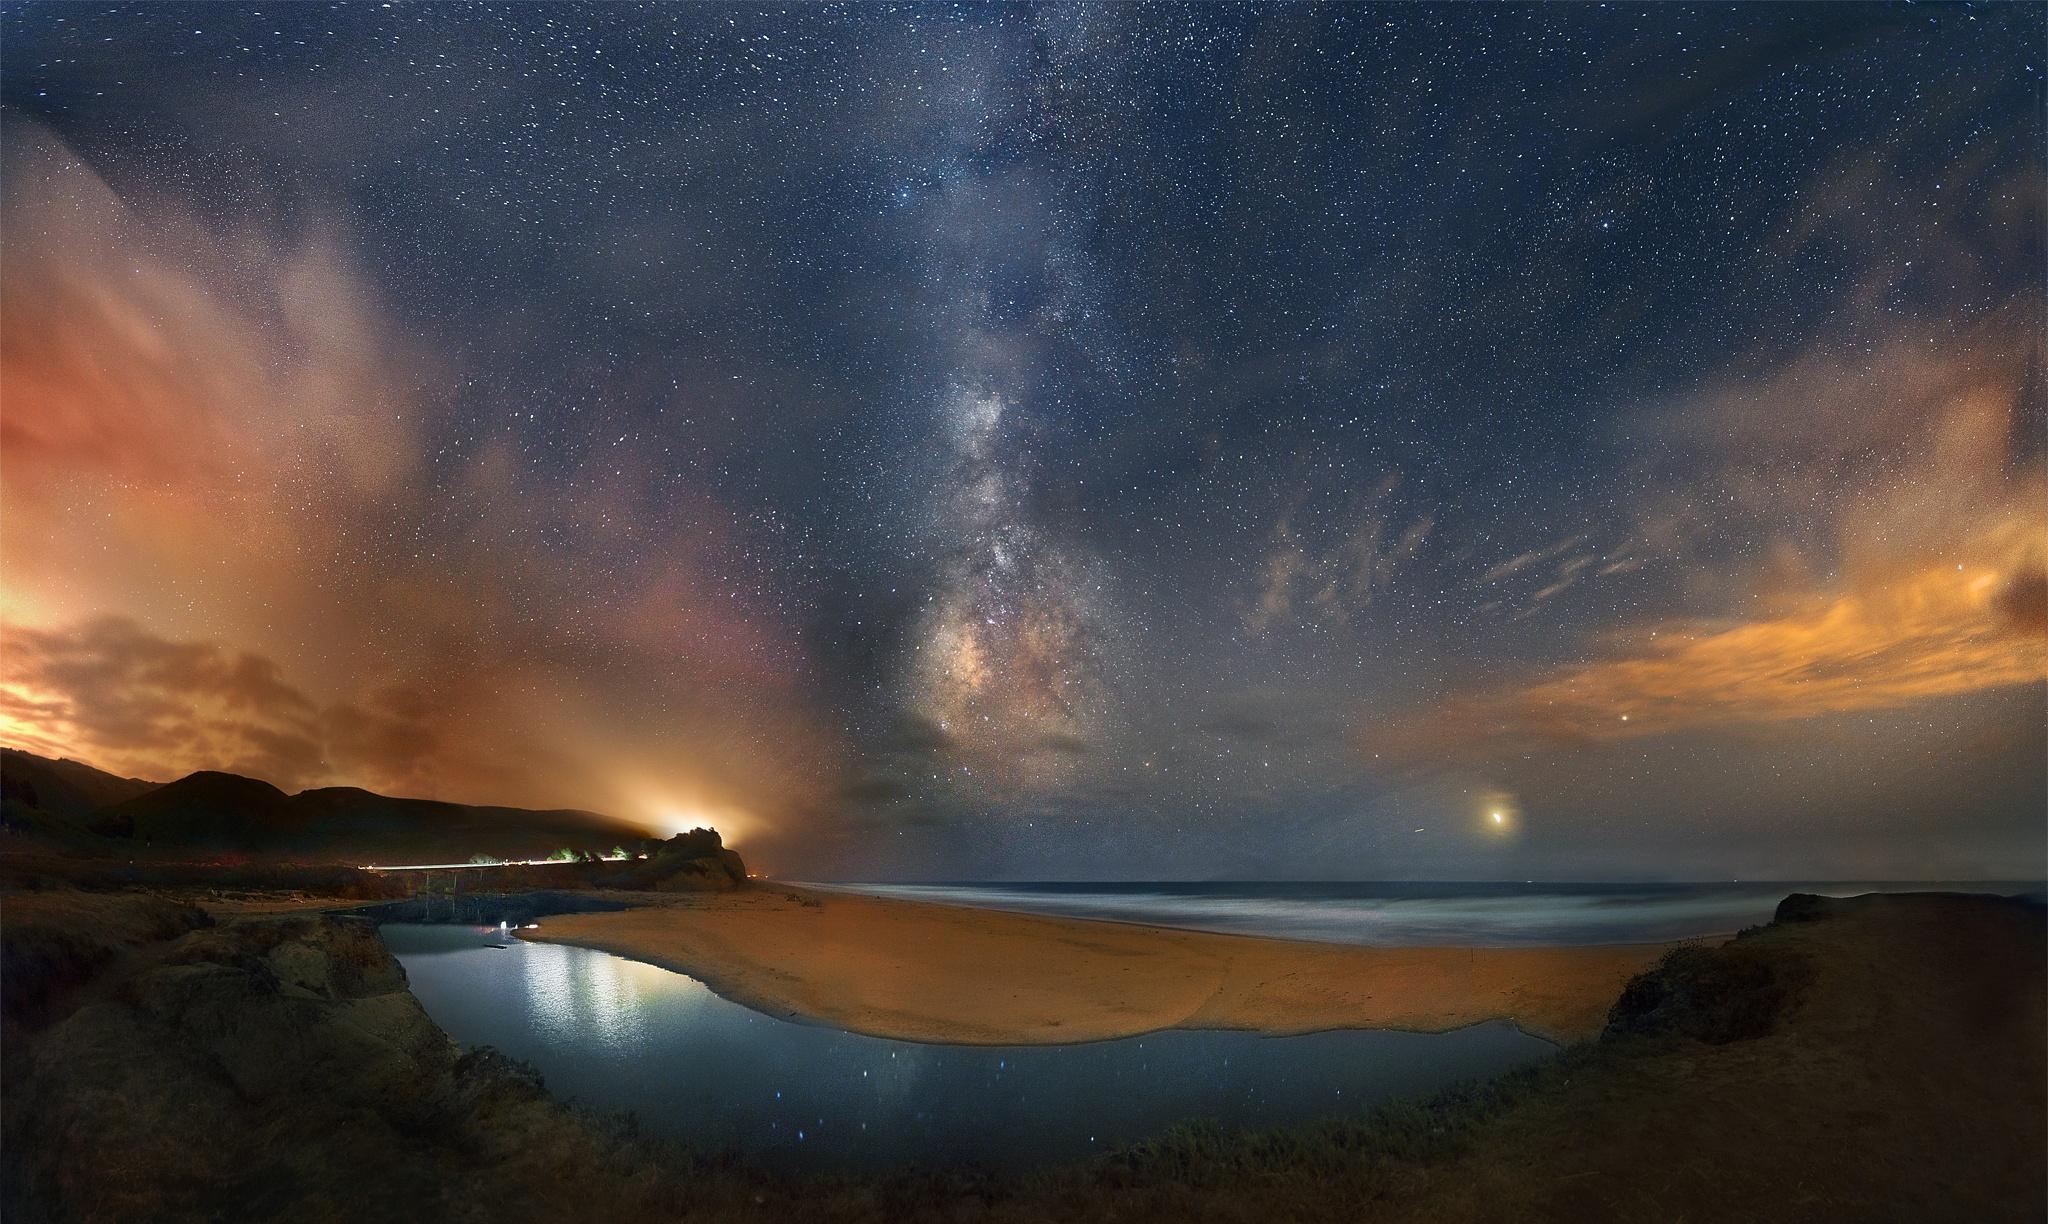 Stars in the sky by Pamela Des Barres